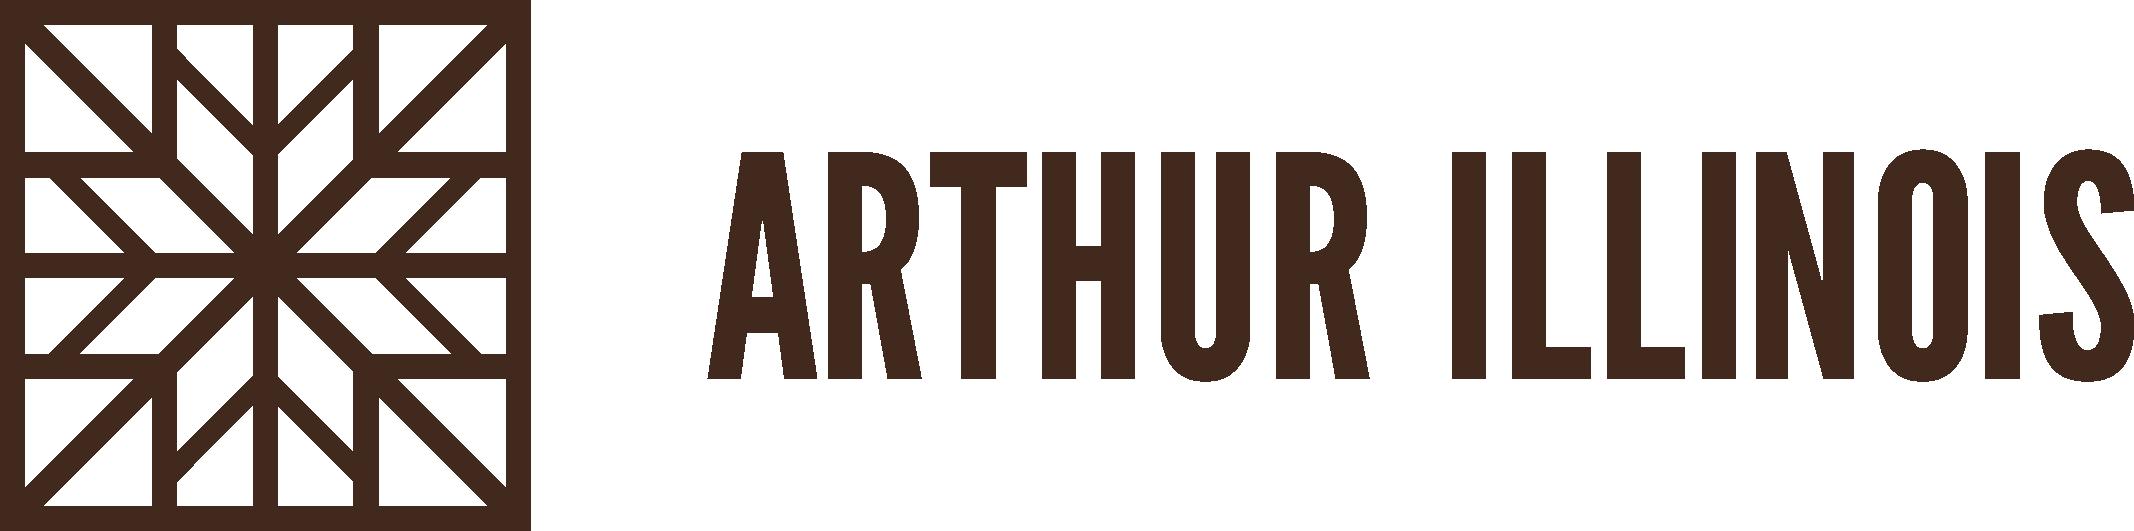 Arthur, IL | Branding